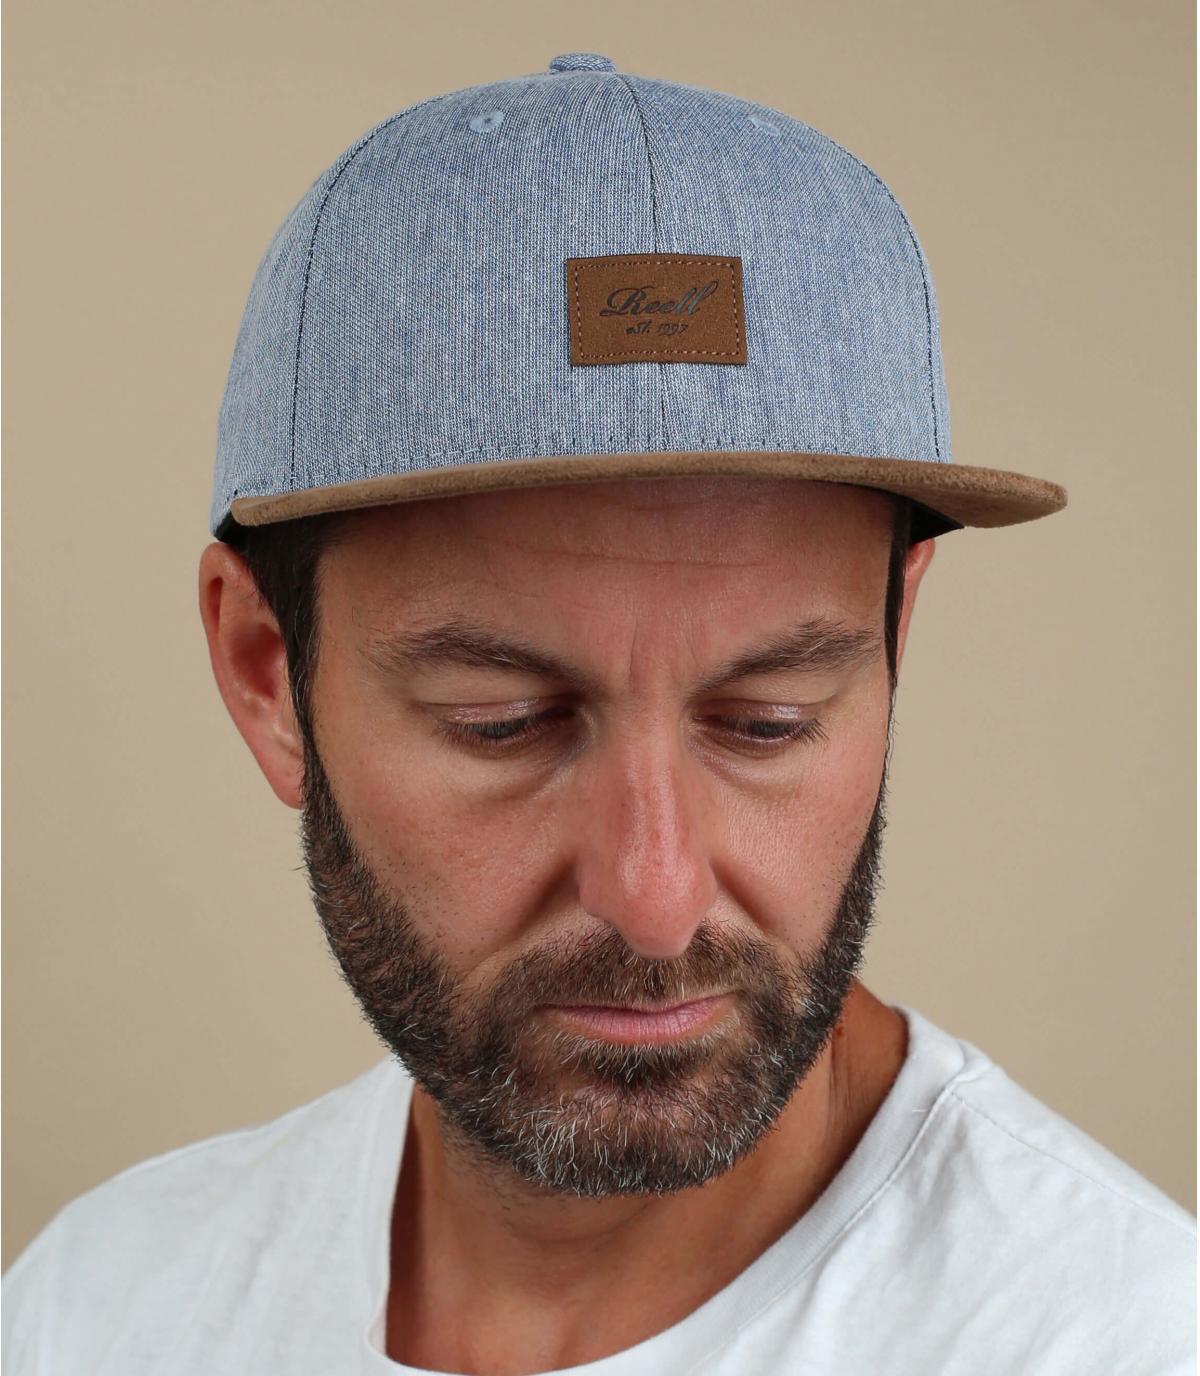 Cappellino Reell in camoscio blu melange